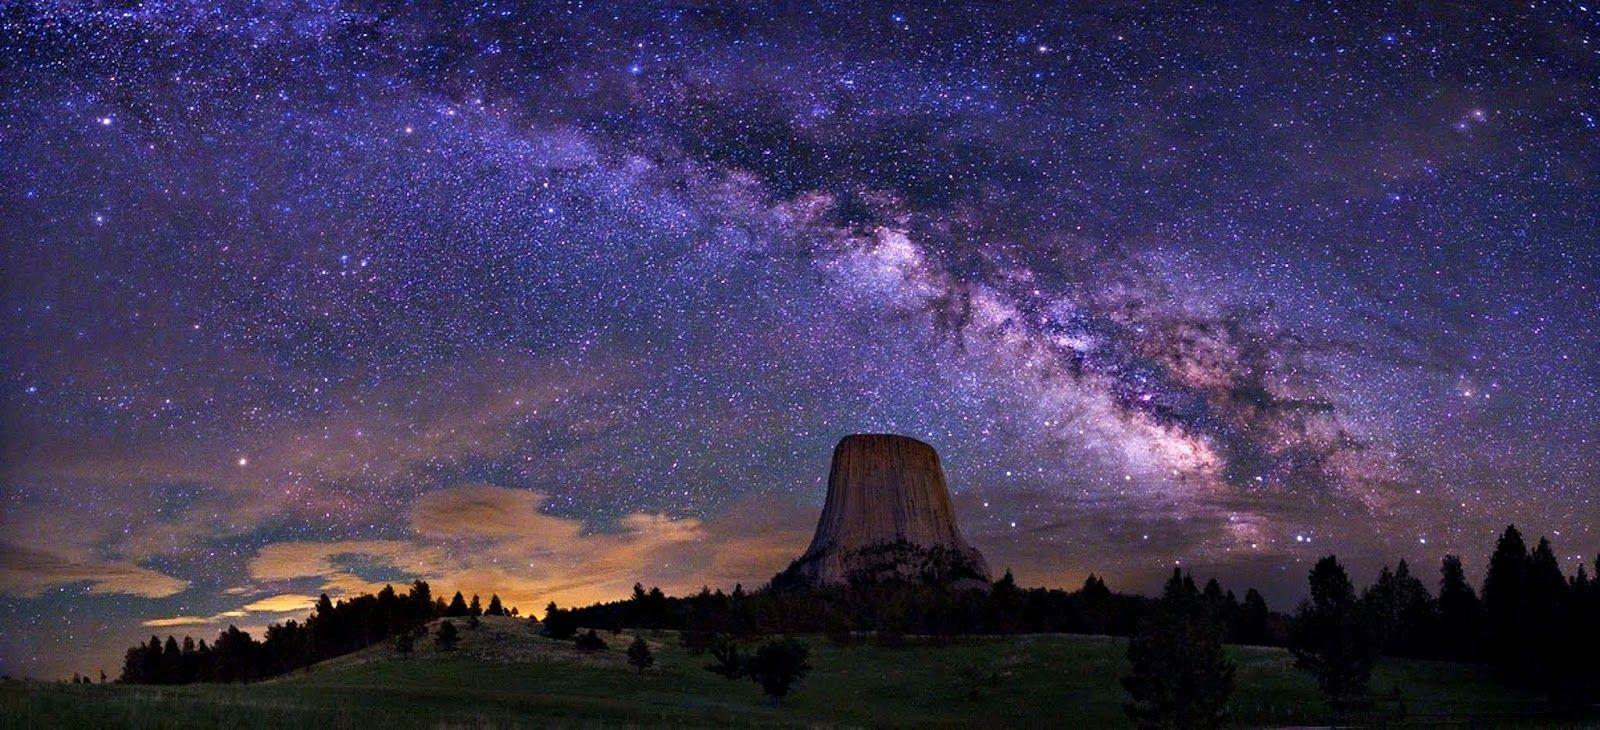 milky way galaxy edge on view - photo #39